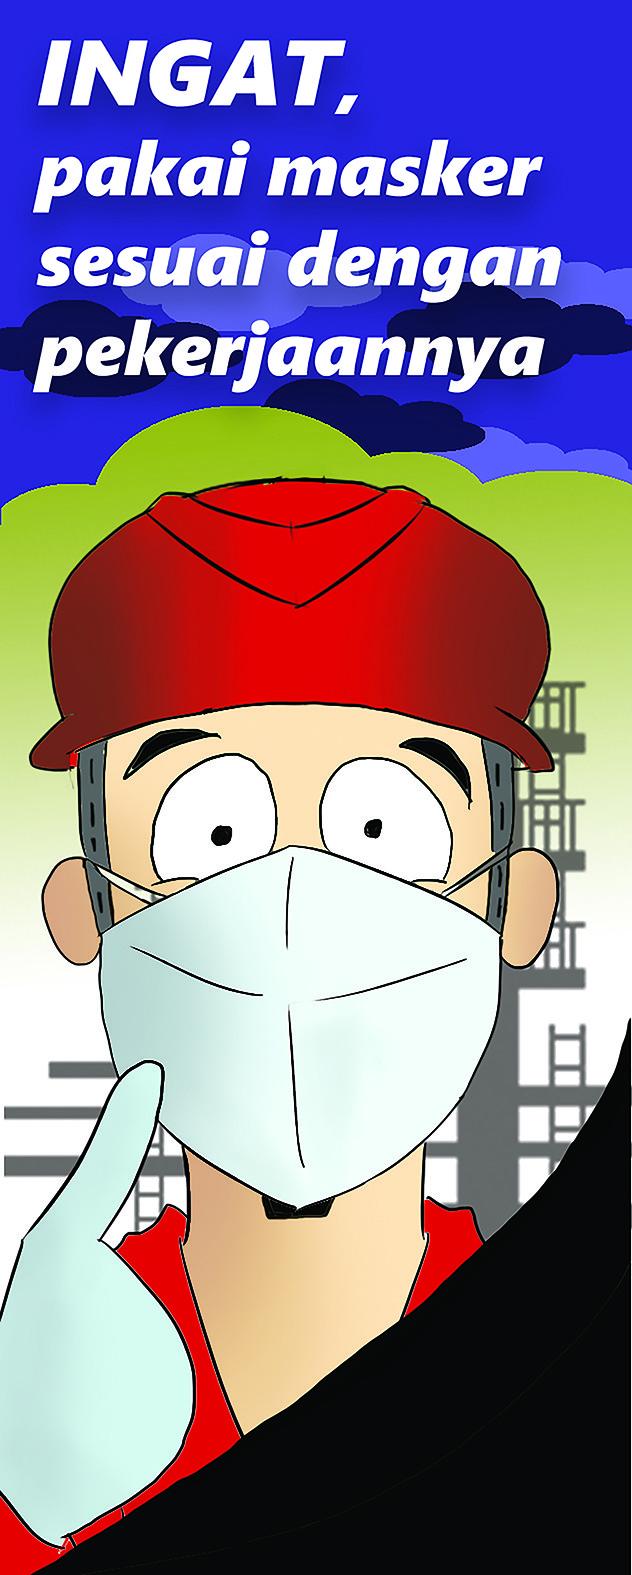 Putra wira adhiprajna pertamina masker